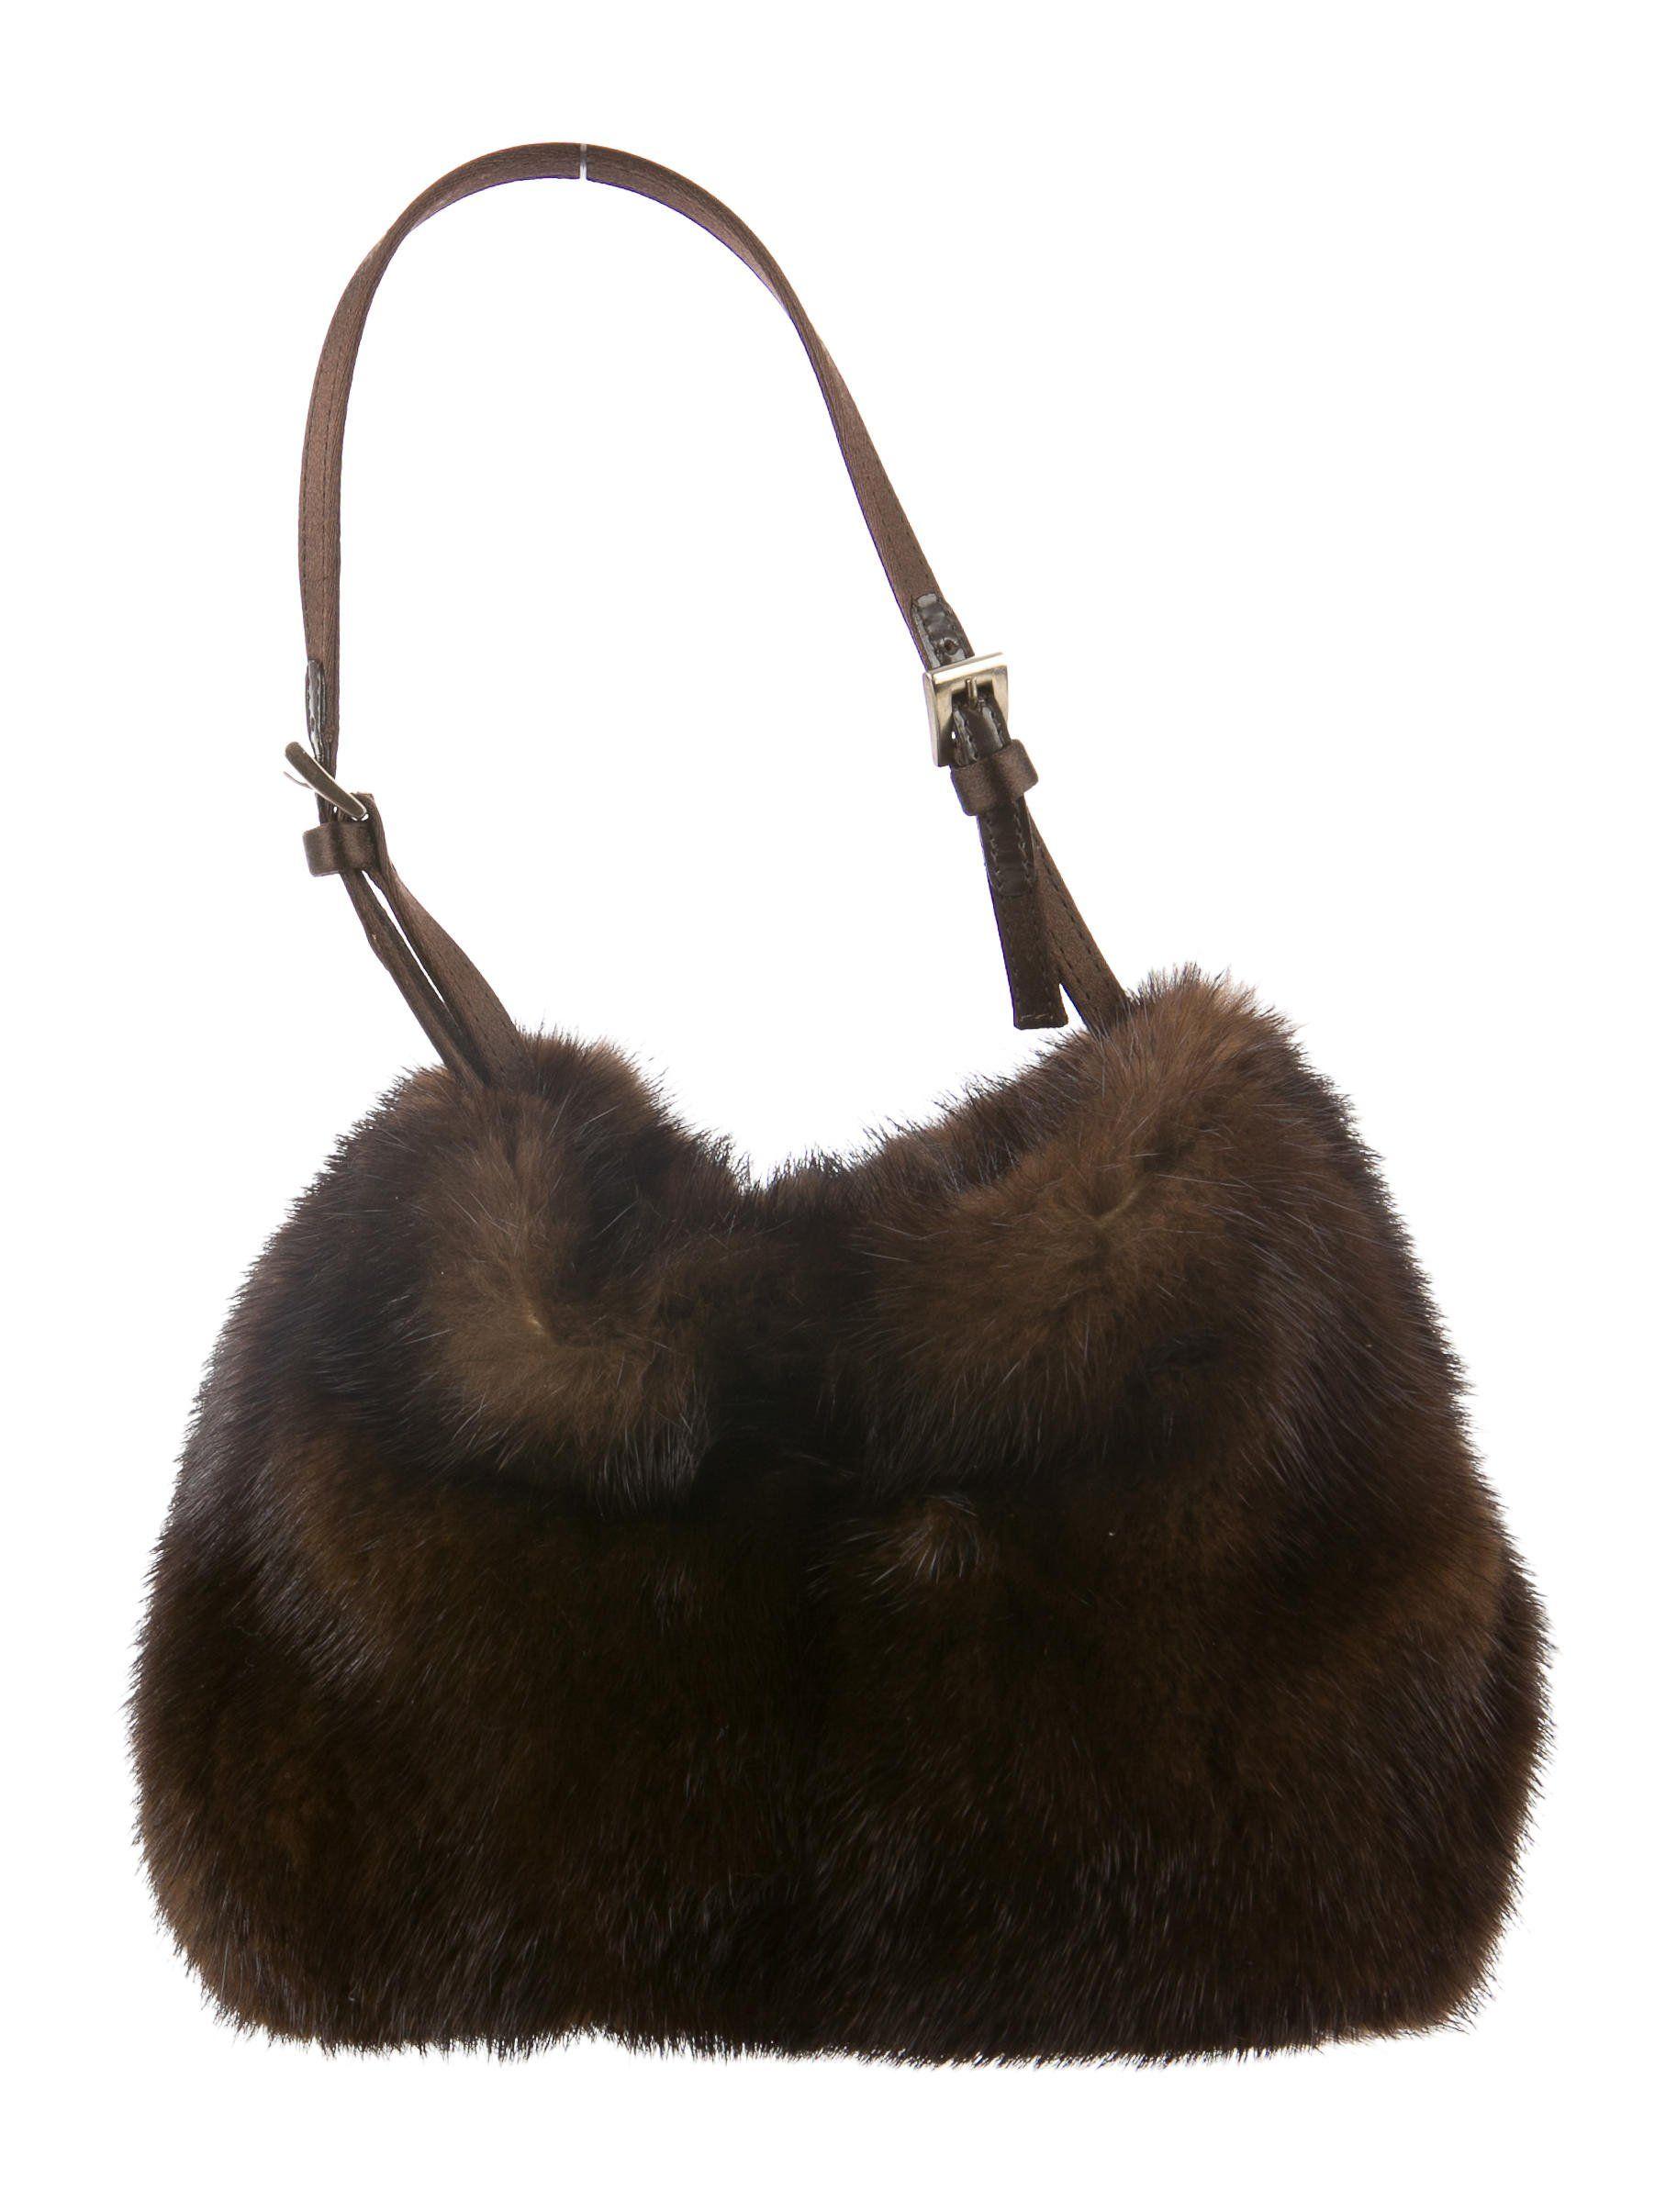 d27bf9de6f11b9 Mink Evening Bag | Evening Bags | Bags, Evening bags, Prada